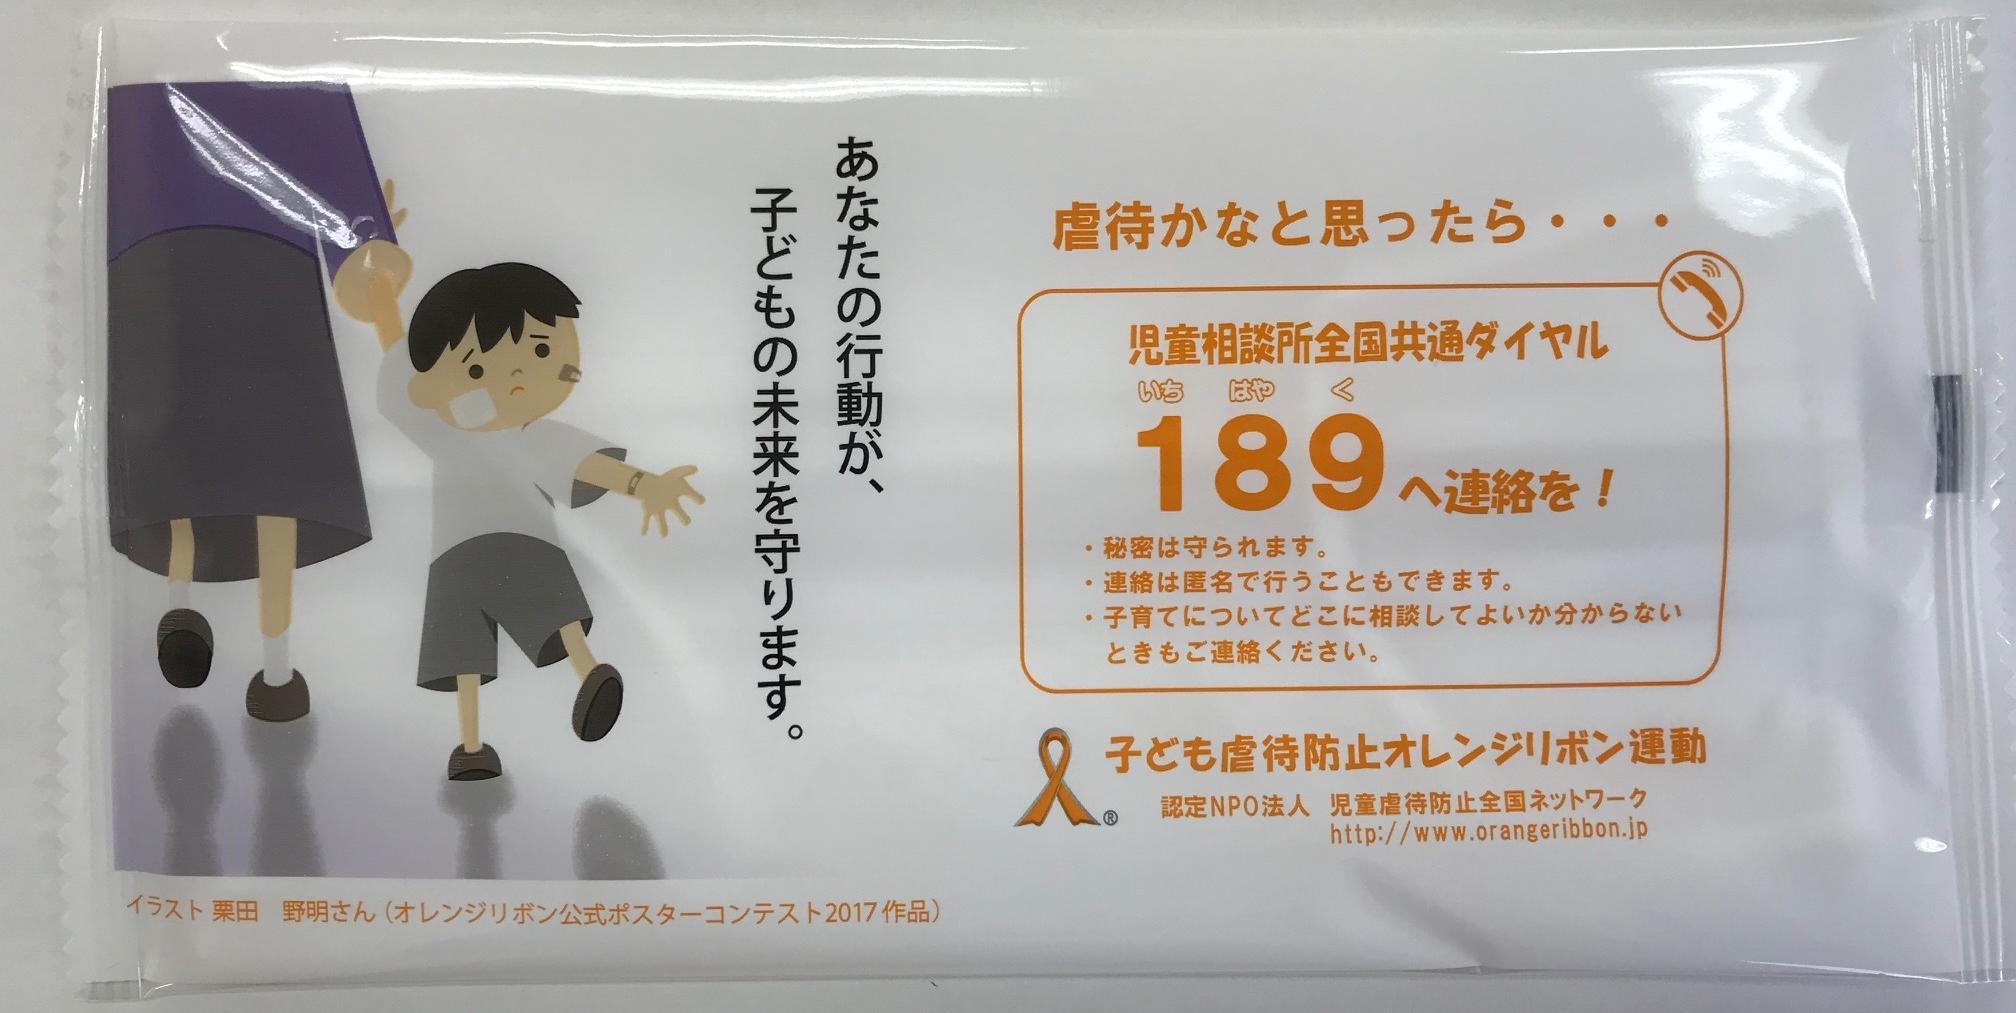 http://www.orangeribbon.jp/info/npo/b4fc64b0b1f711c83e818865378ef197d5ea1751.jpeg